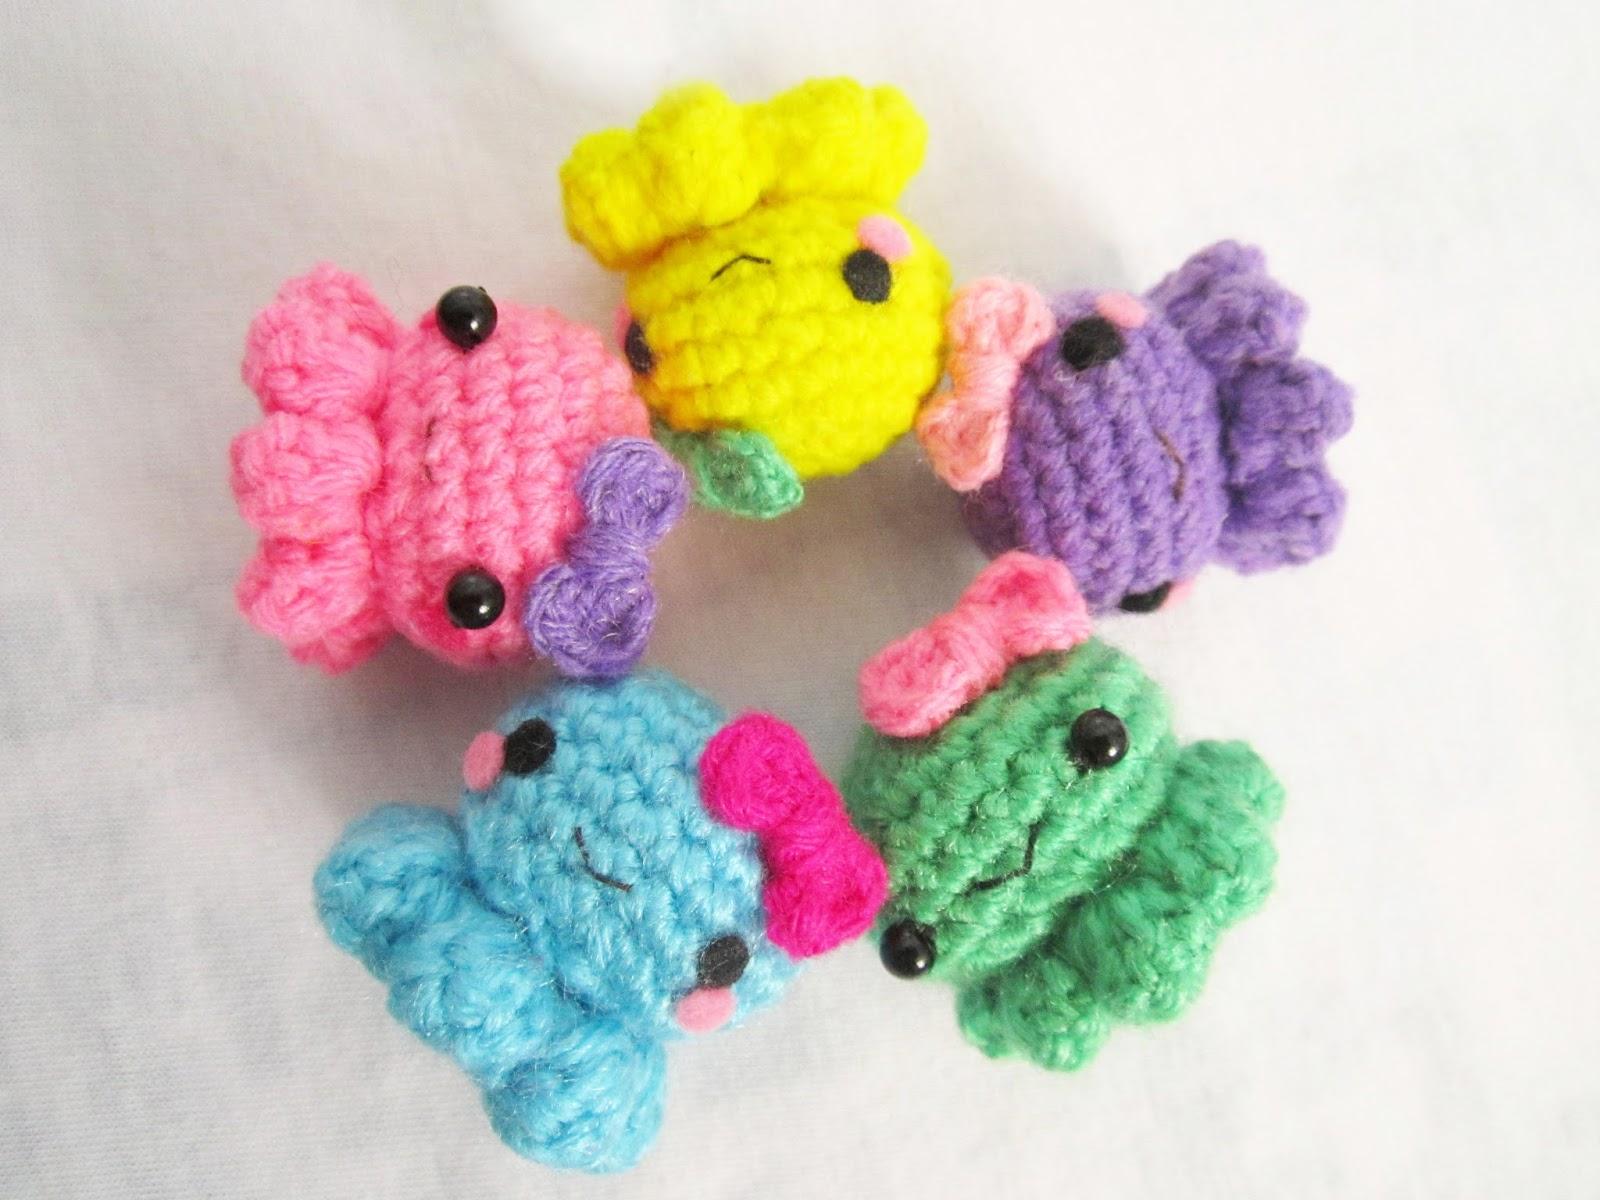 Crochet Amigurumi For Baby : Crochet amigurumi bunnybunny with bow tie toy newborn gift